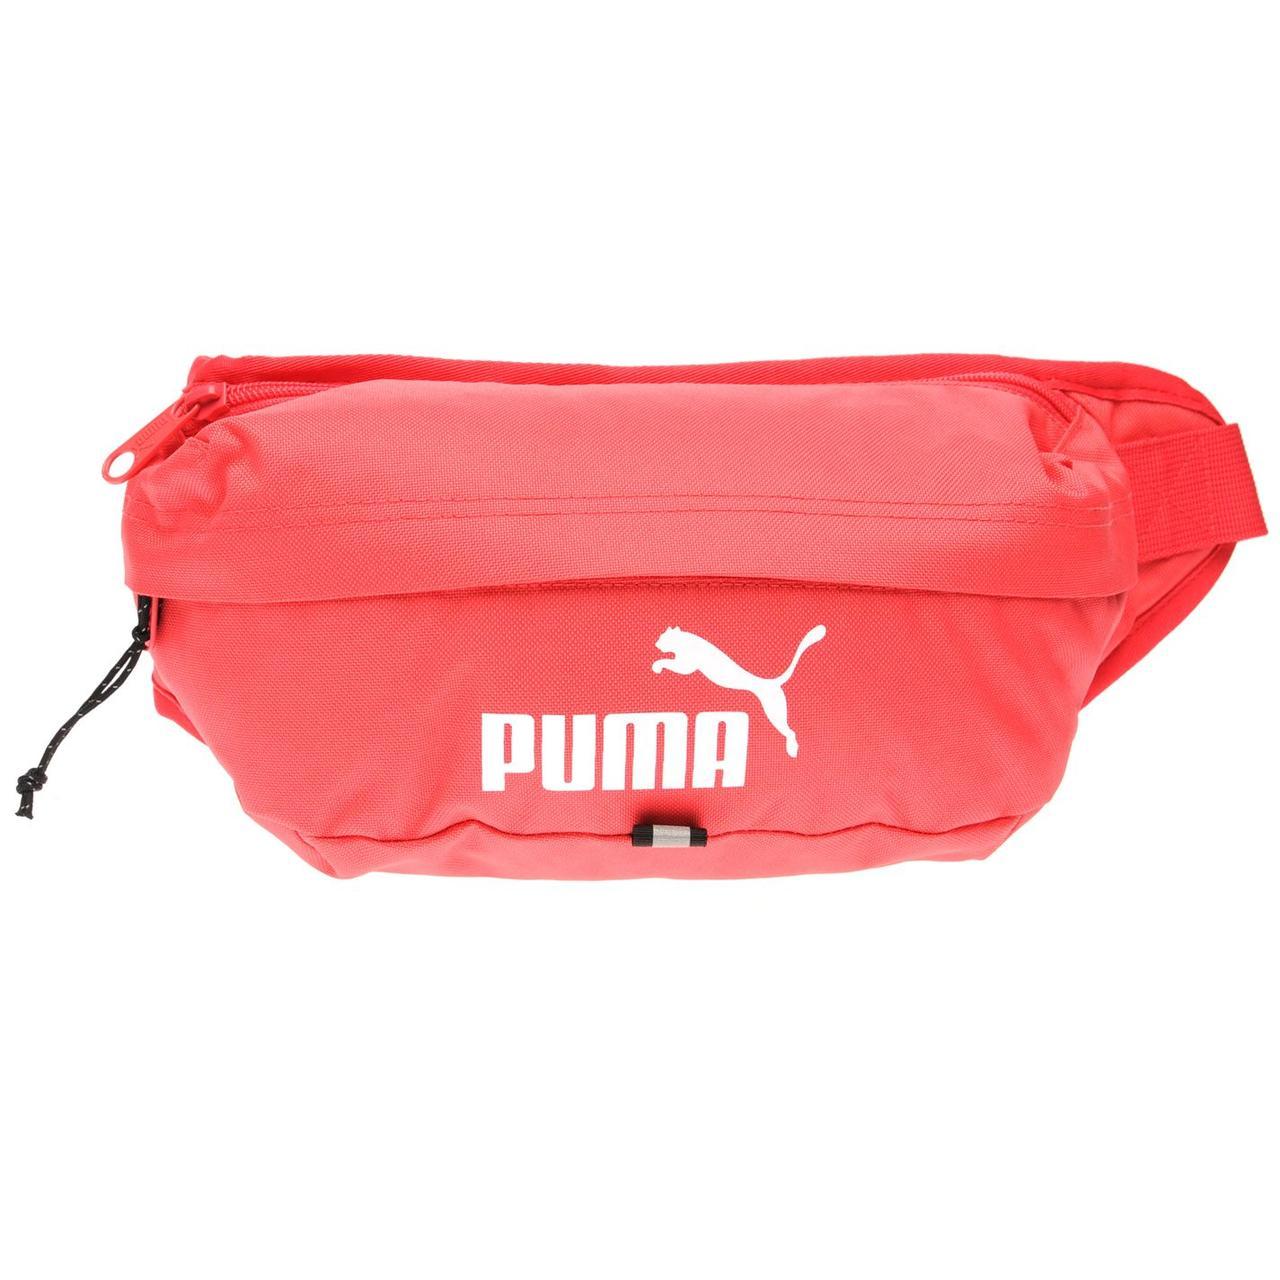 9a55c658 Сумка Puma Academy Bum Оригинал В Наличии! — в Категории